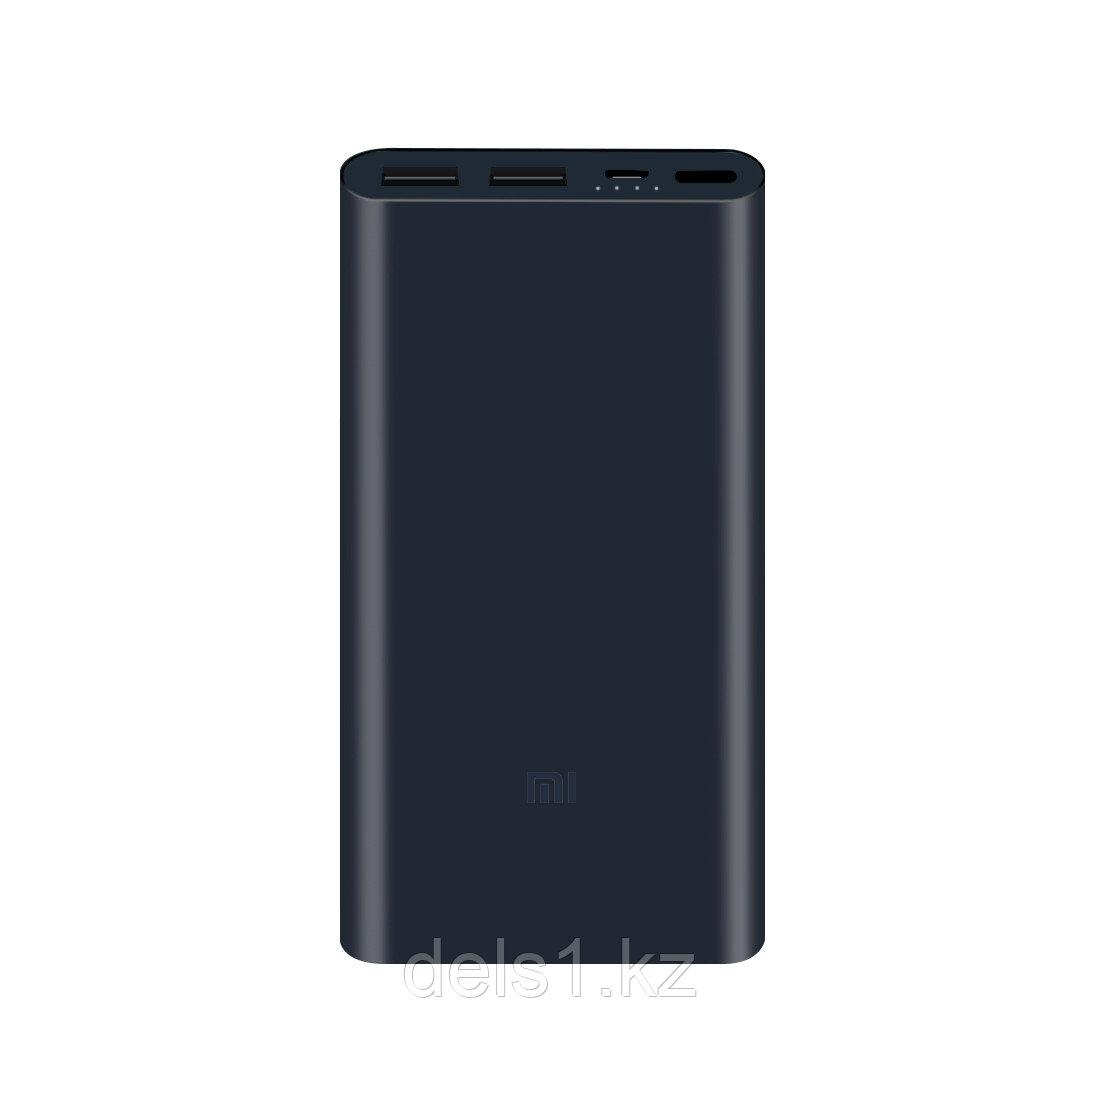 Портативное зарядное устройство Xiaomi Mi Power Bank 10000mAh 2S (2018 2-USB)